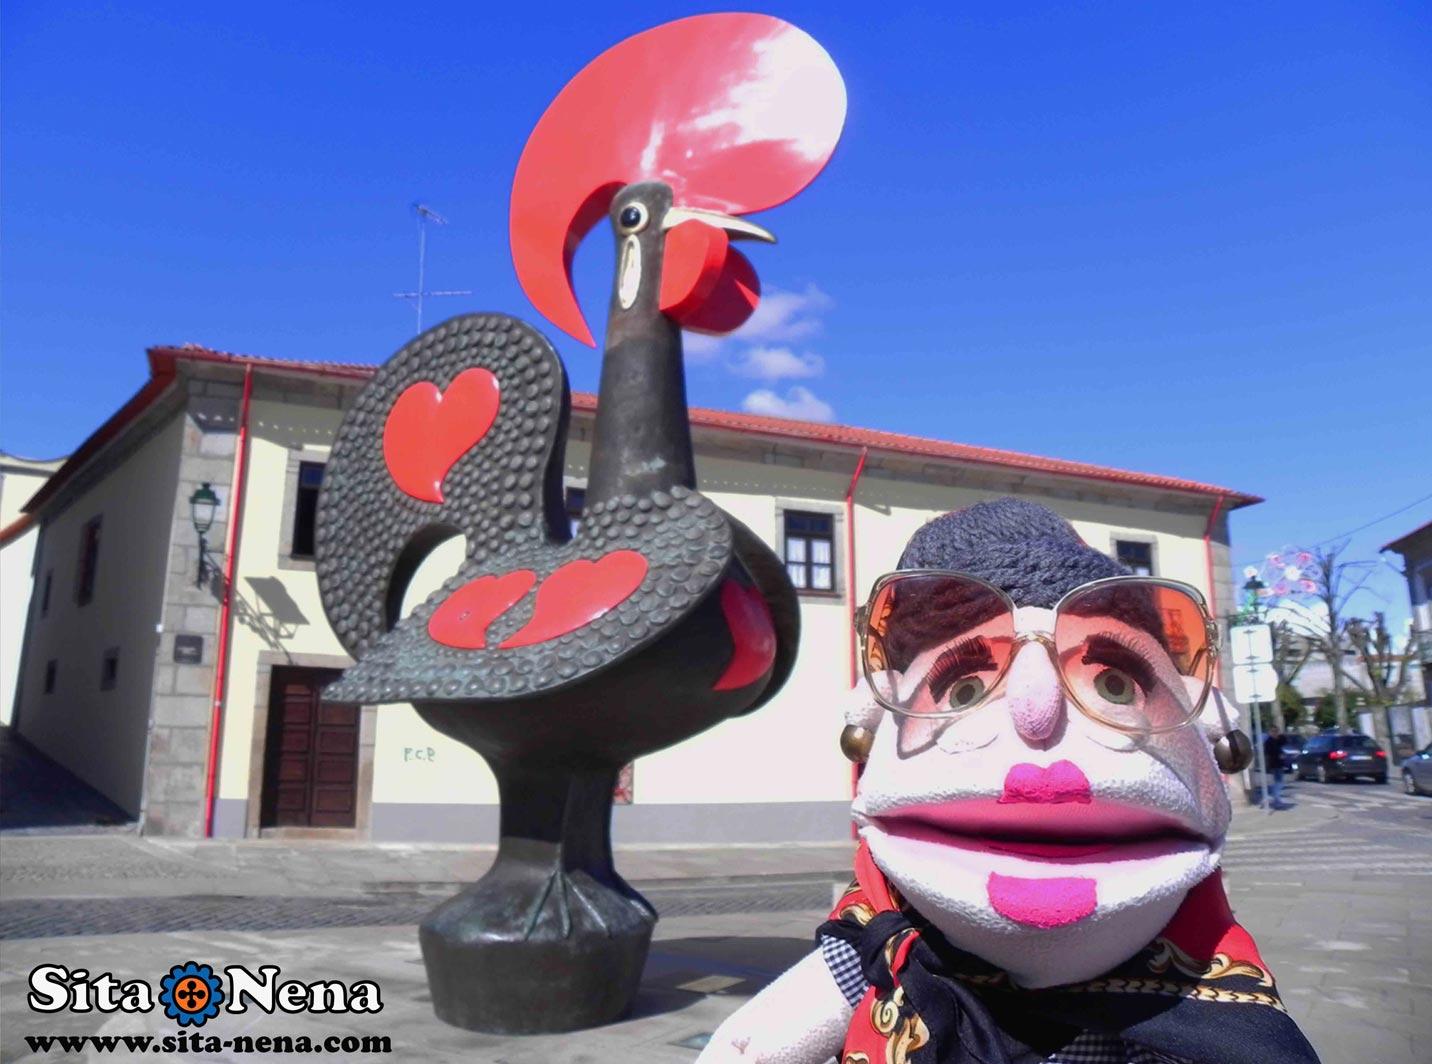 4 sitanena-travelfoodblog-Barcelos